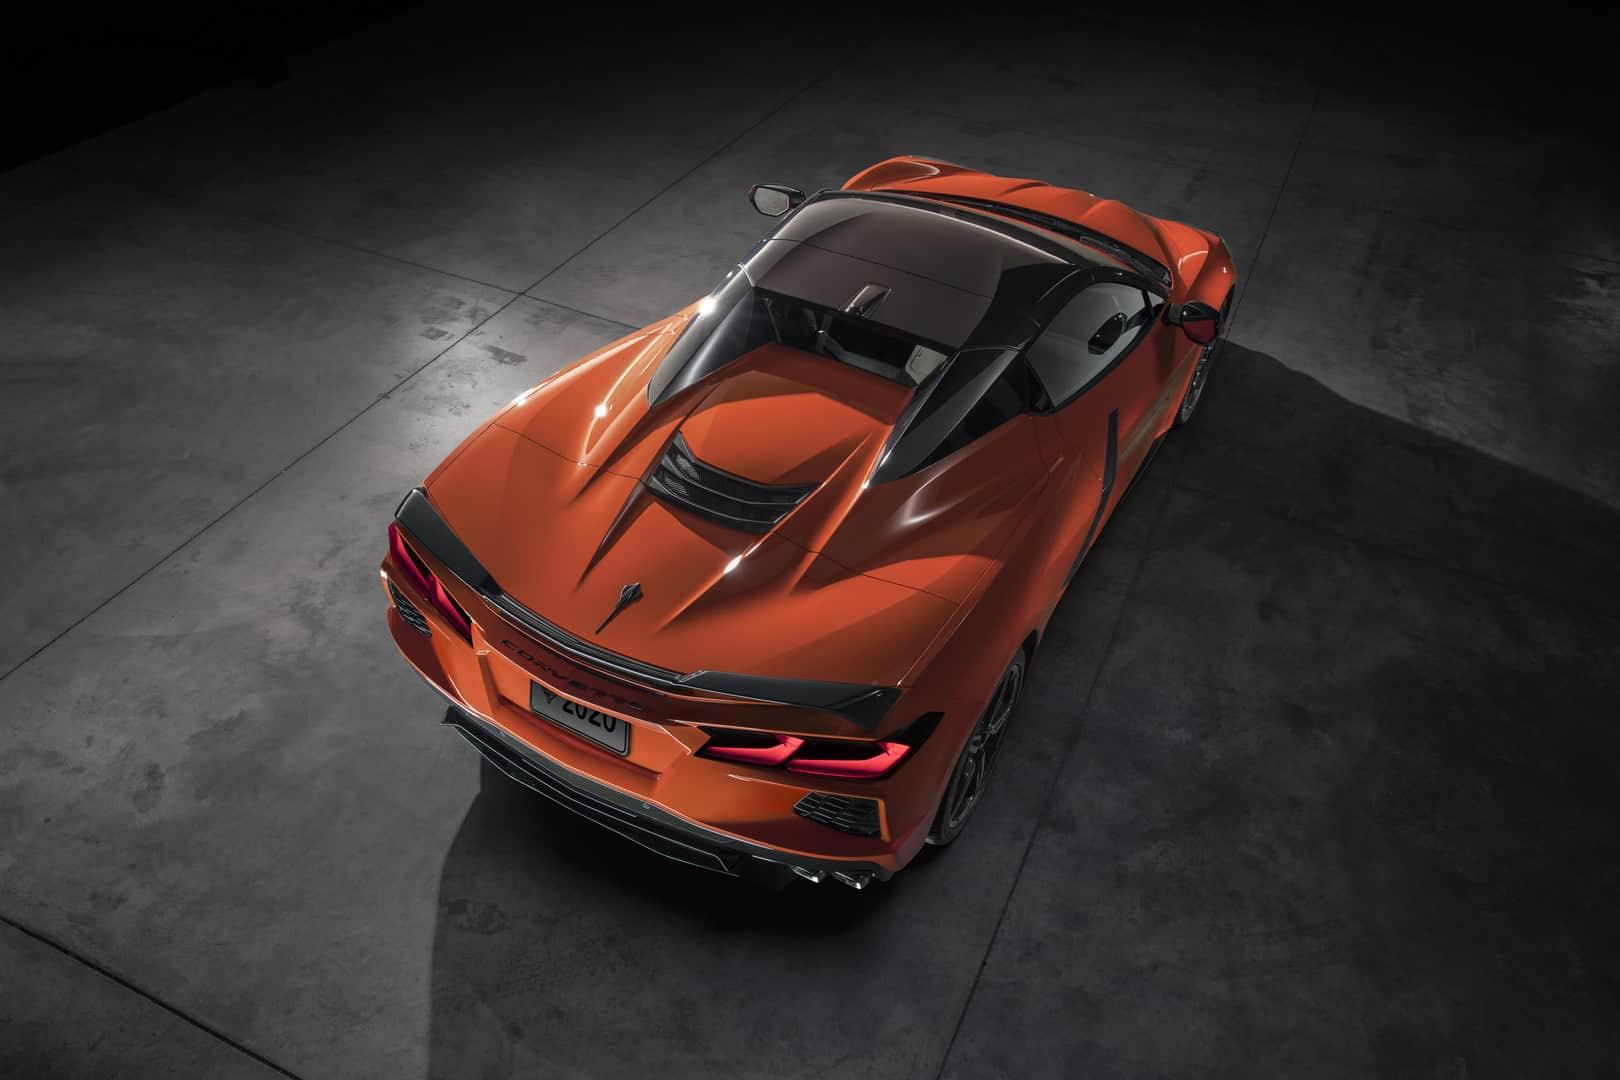 2020 Chevrolet Corvette Stingray Convertible 6